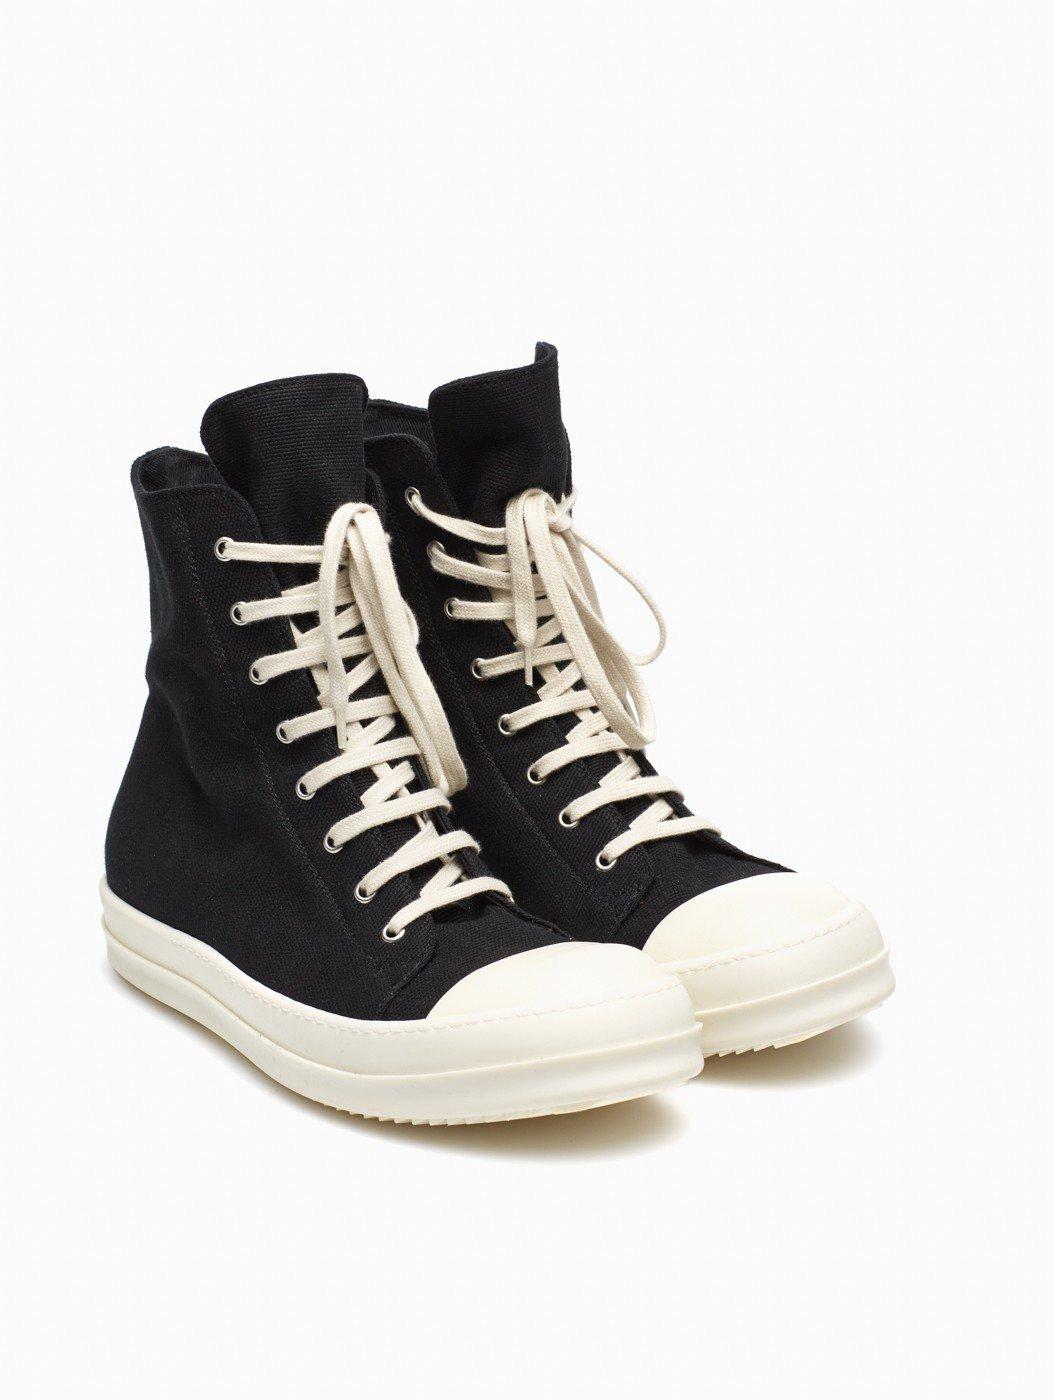 drkshdw by rick owens sneakers in black for men lyst. Black Bedroom Furniture Sets. Home Design Ideas